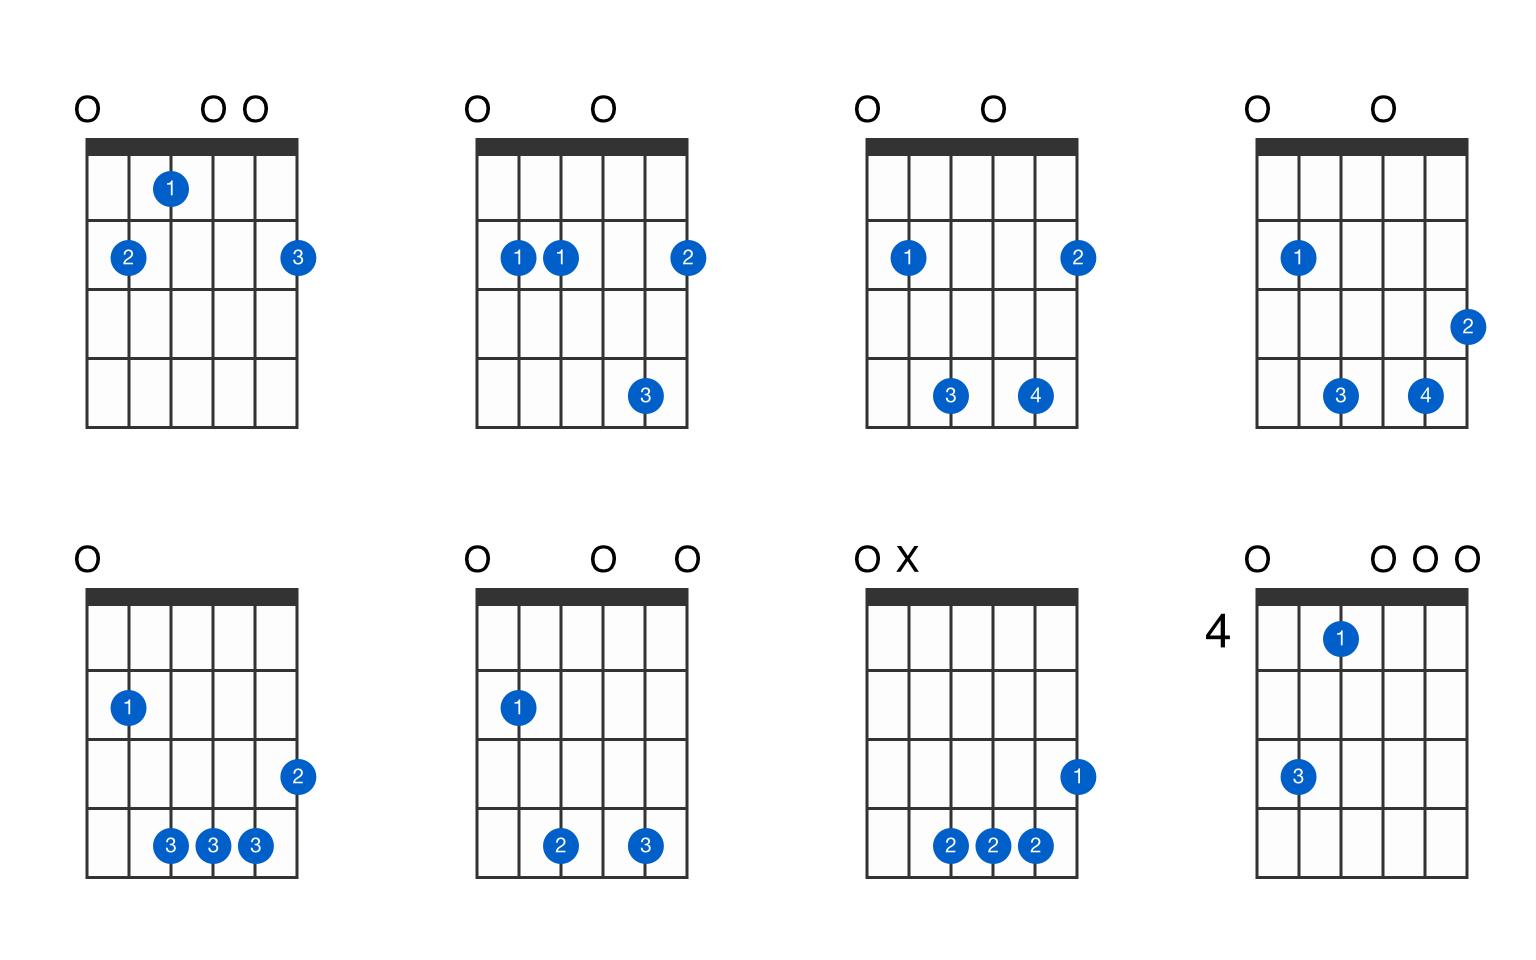 E minor major 15 guitar chord   GtrLib Chords